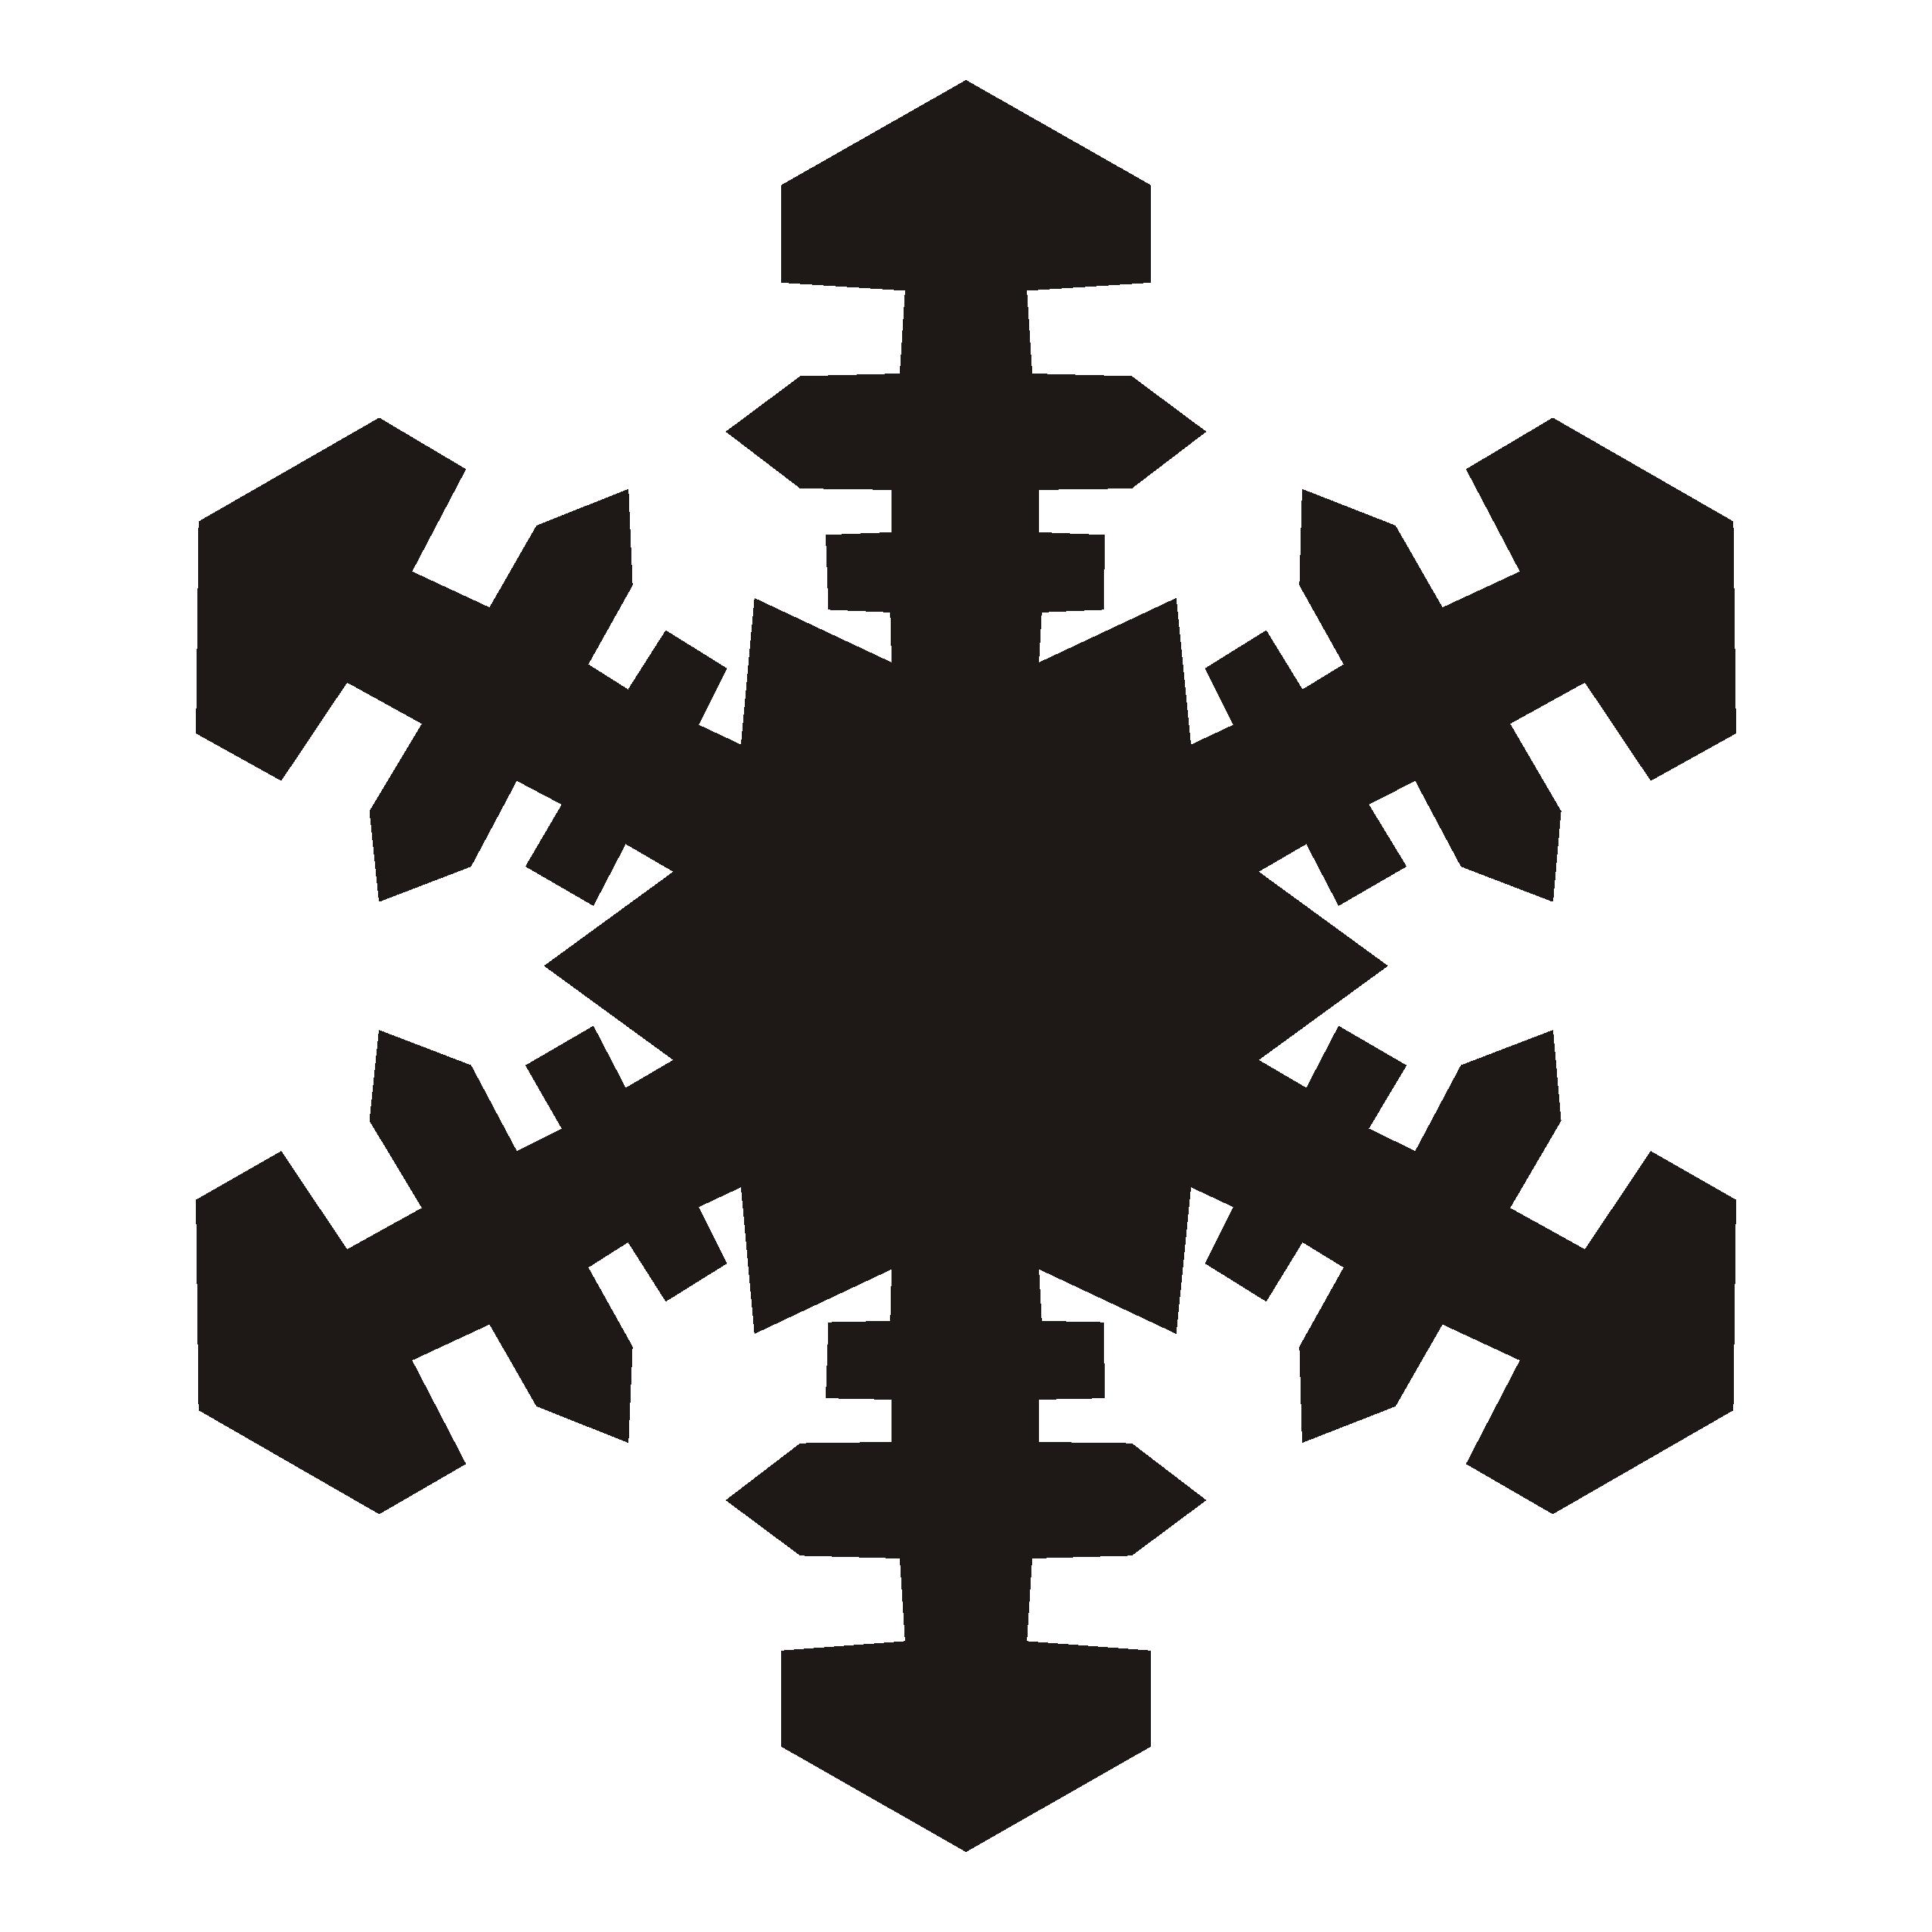 2555x2555 Top 63 Snowflake Clip Art